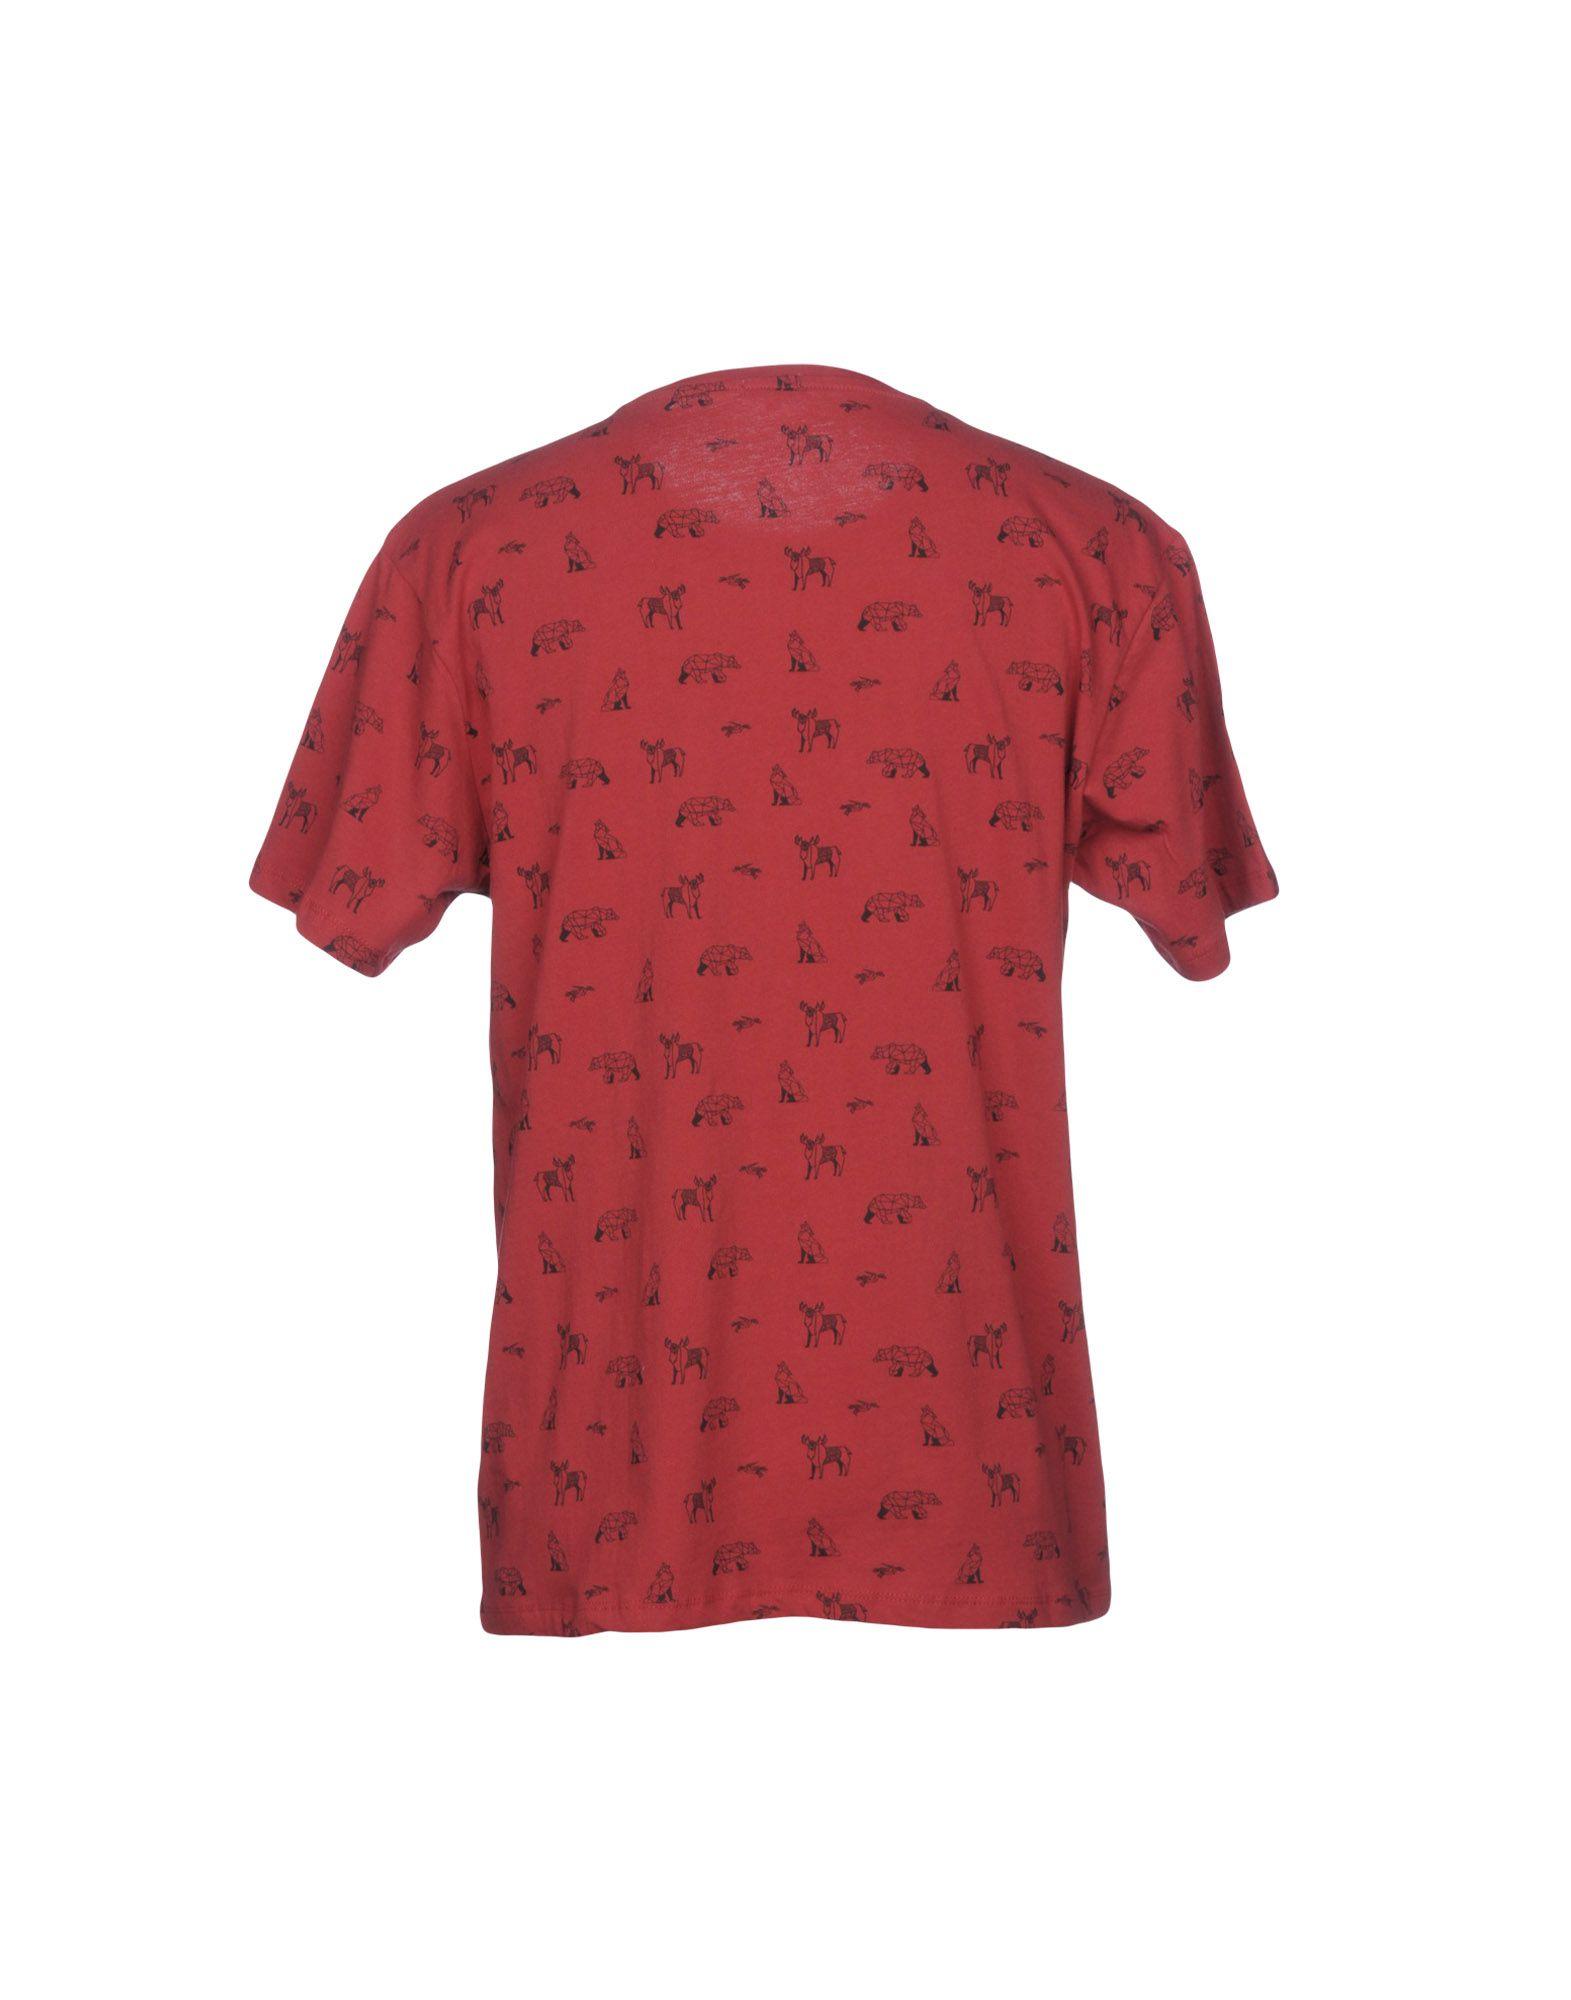 A buon mercato A buon mercato T-Shirt - Scout Uomo - T-Shirt 12171041WM e1aecc